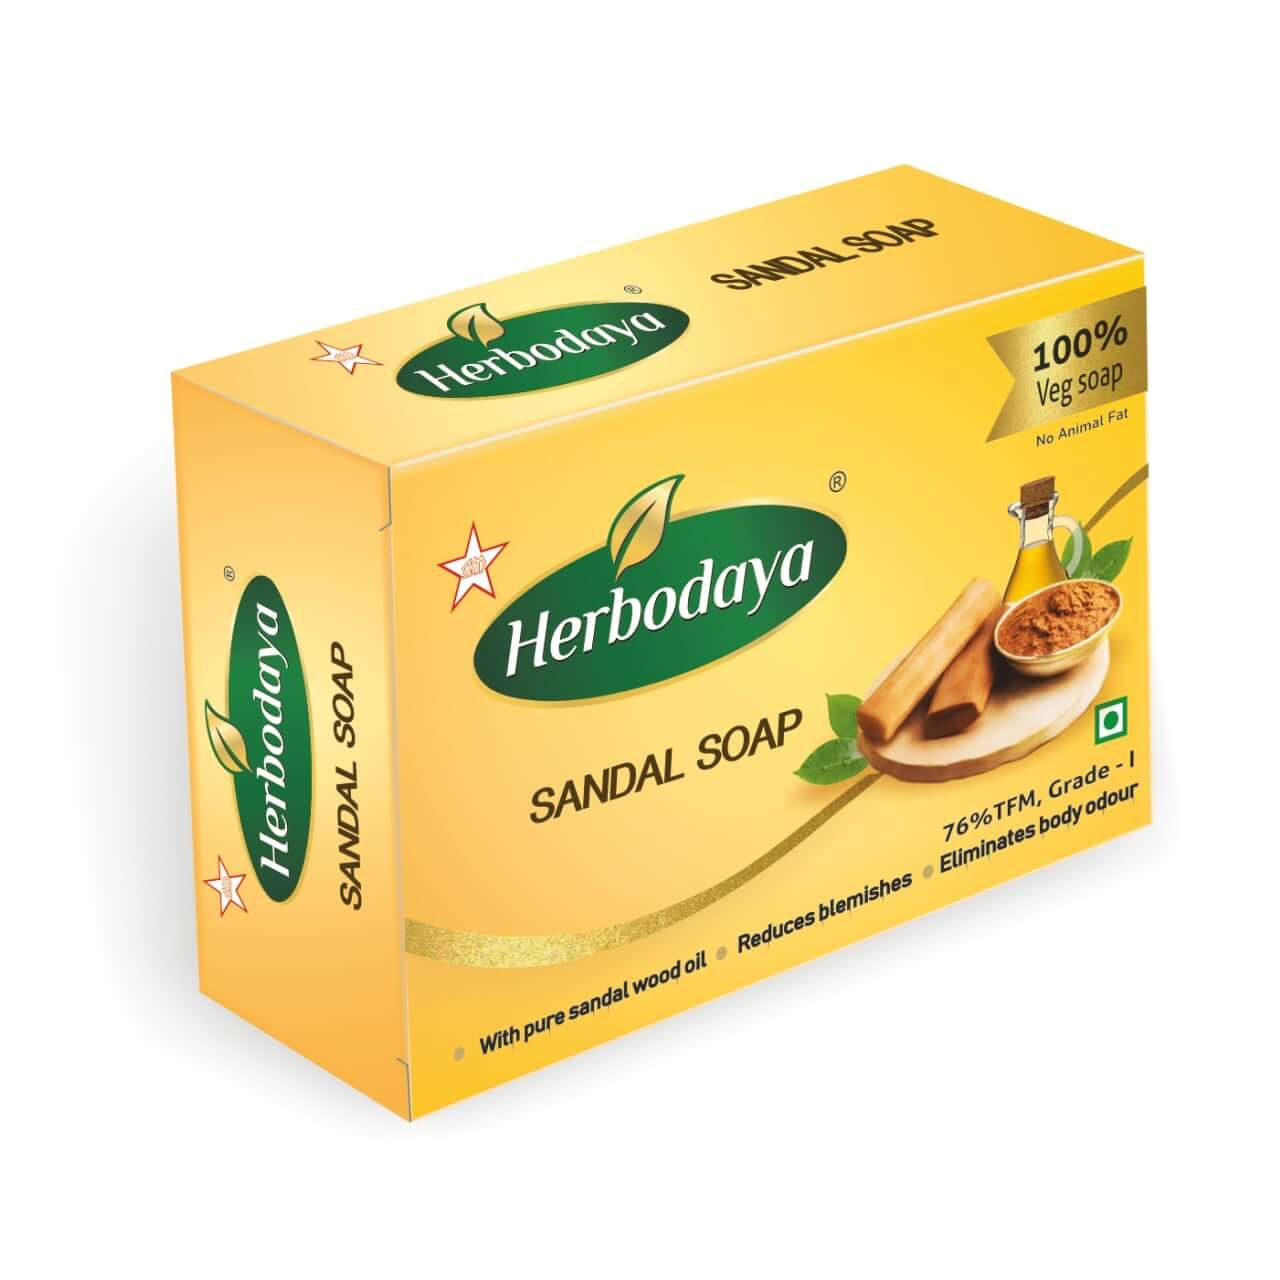 sandal soap_1280x1280-min